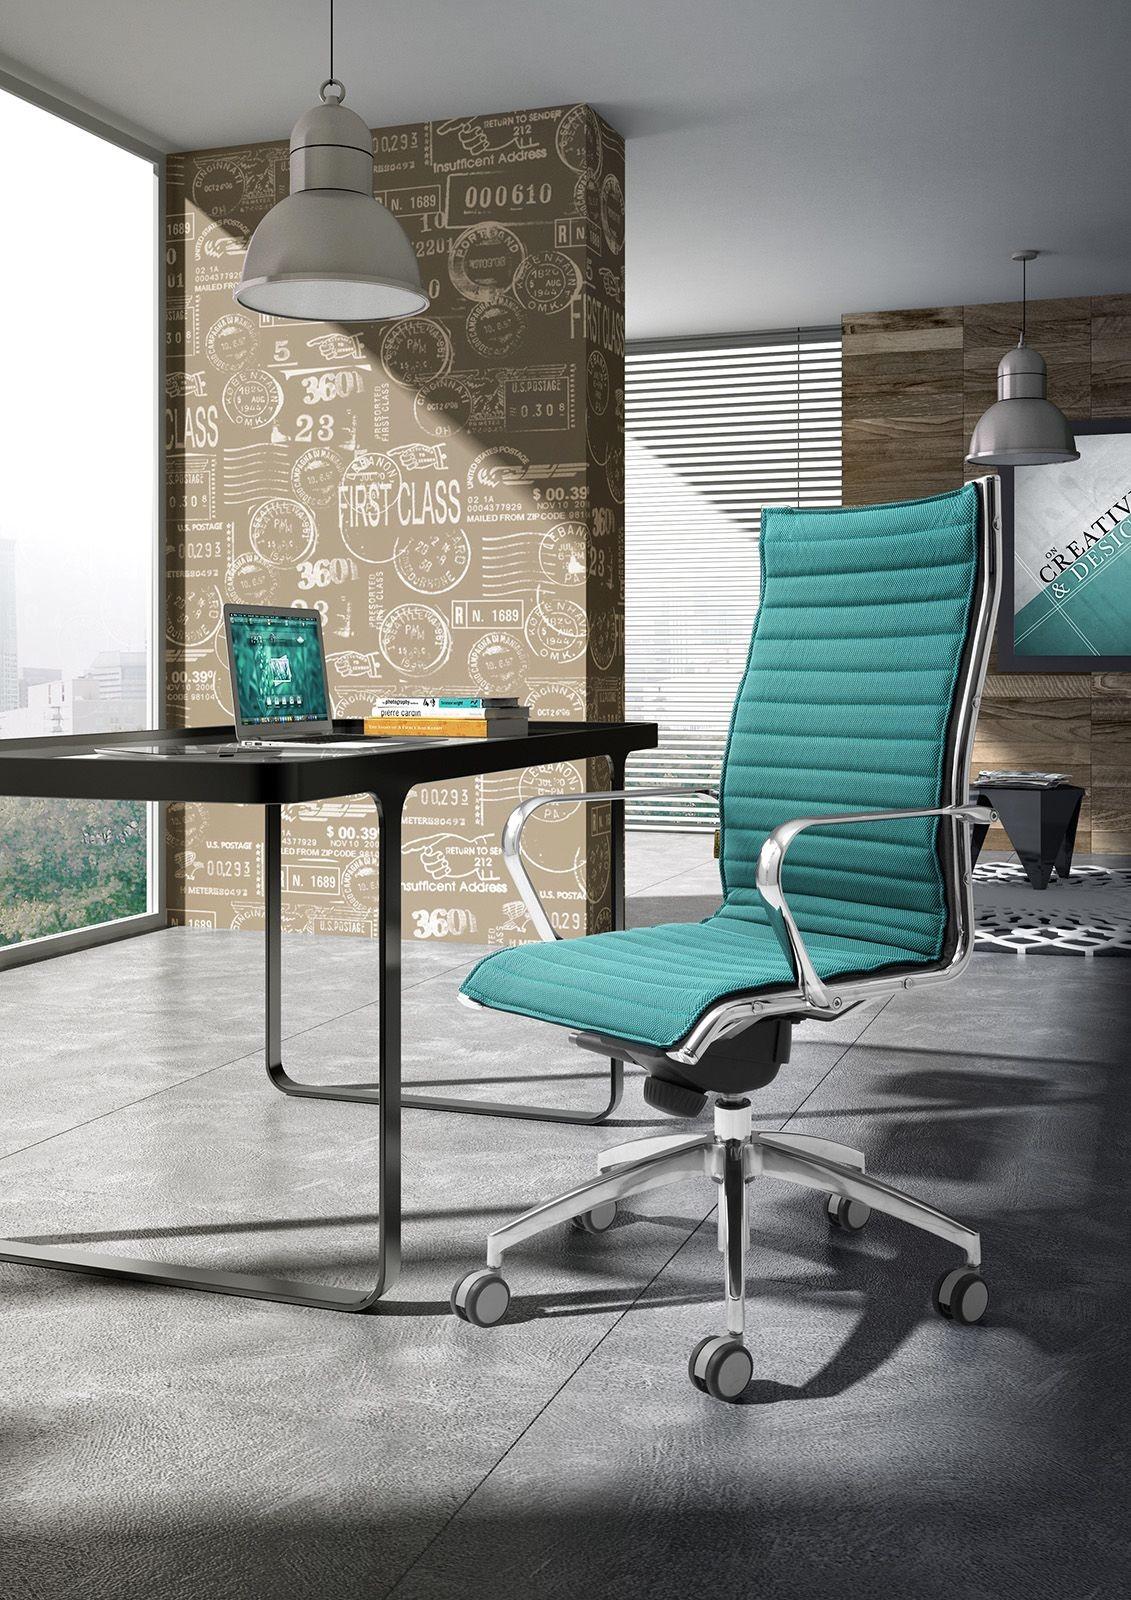 Origami IN high executive 70110M, Silla de la oficina presidencial, aluminio cromado